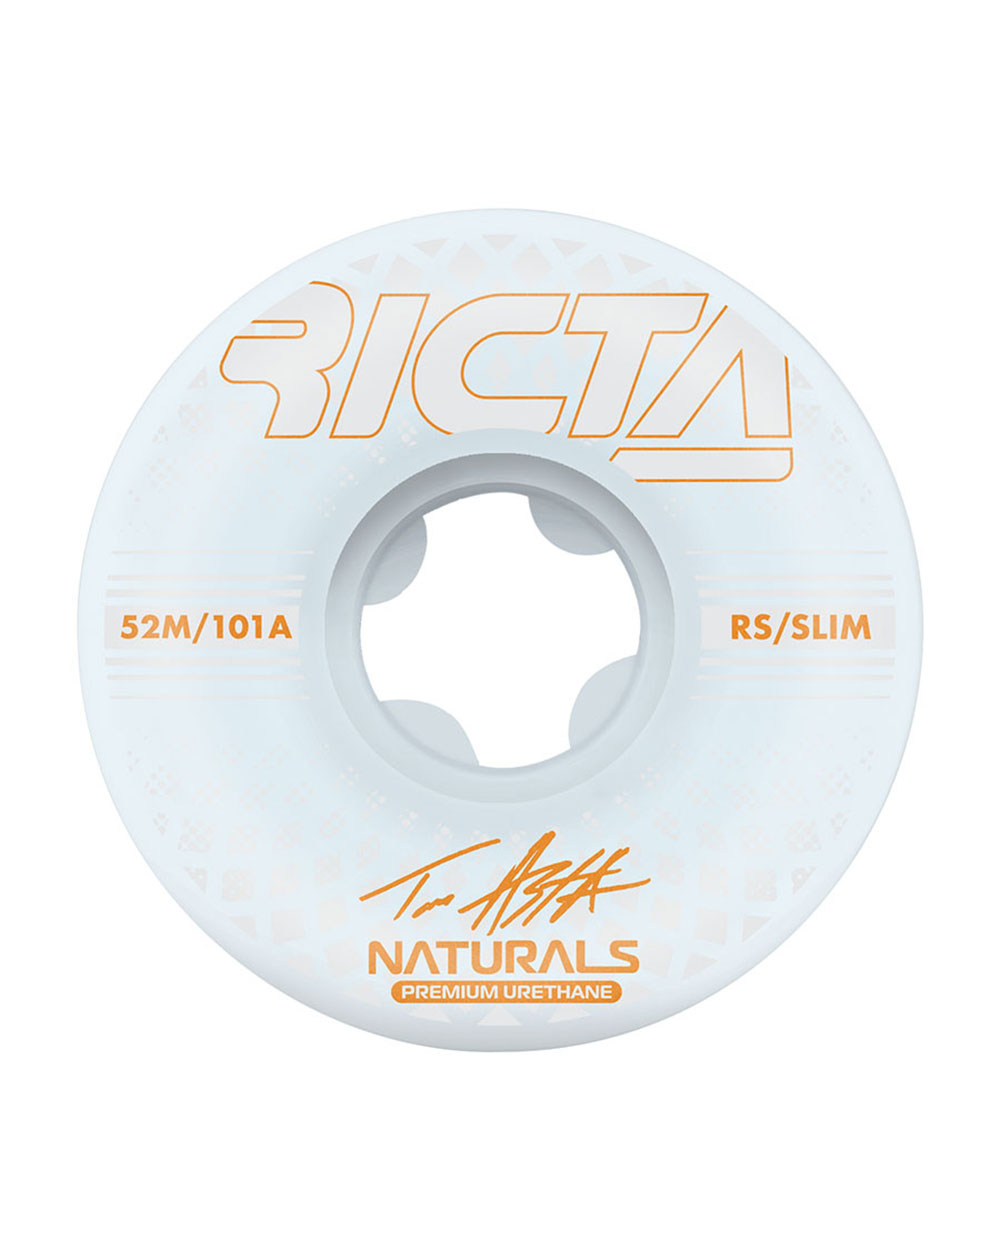 Ricta Asta Reflective Naturals Slim 52mm 101A Skateboard Wheels pack of 4